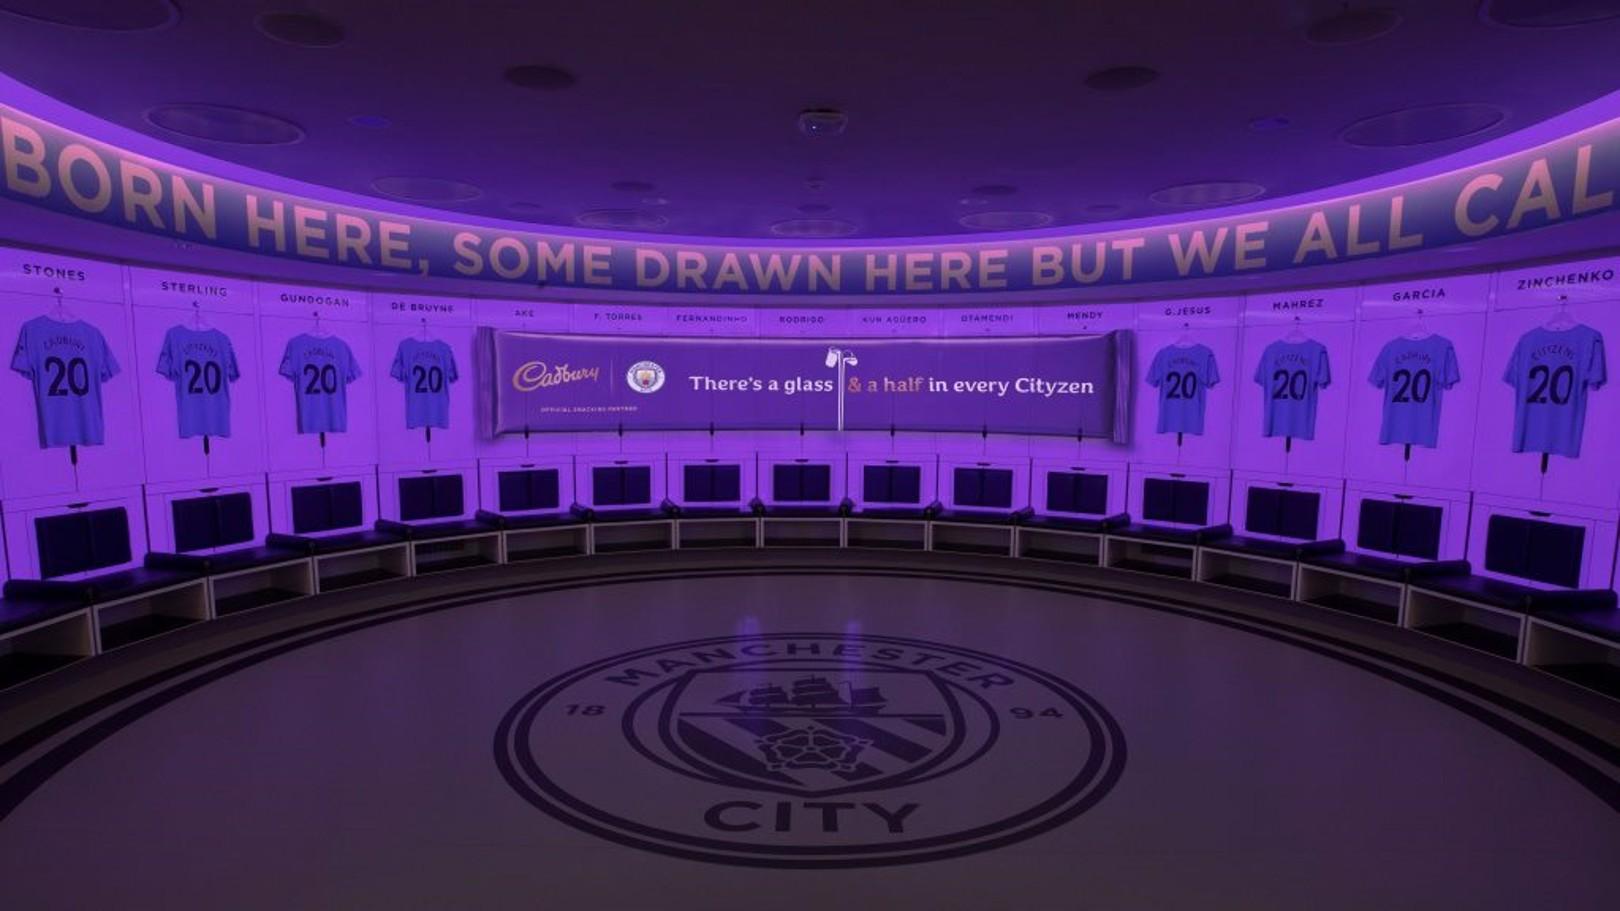 Manchester City announce new regional partnership with Mondelēz